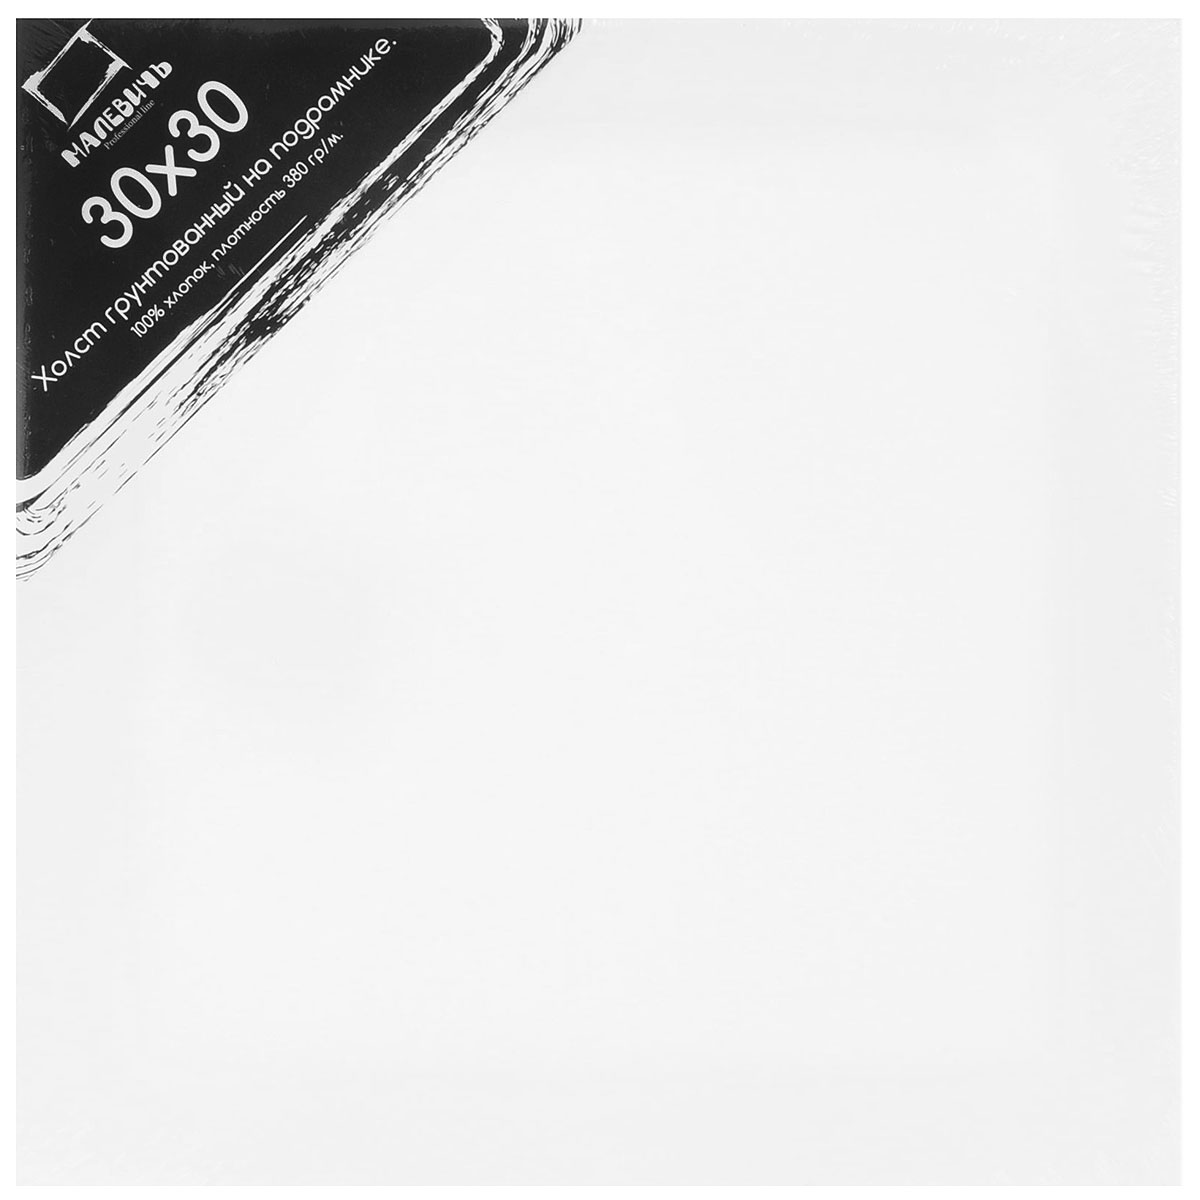 Малевичъ Холст на подрамнике 30 см x 30 см 380 г/м2